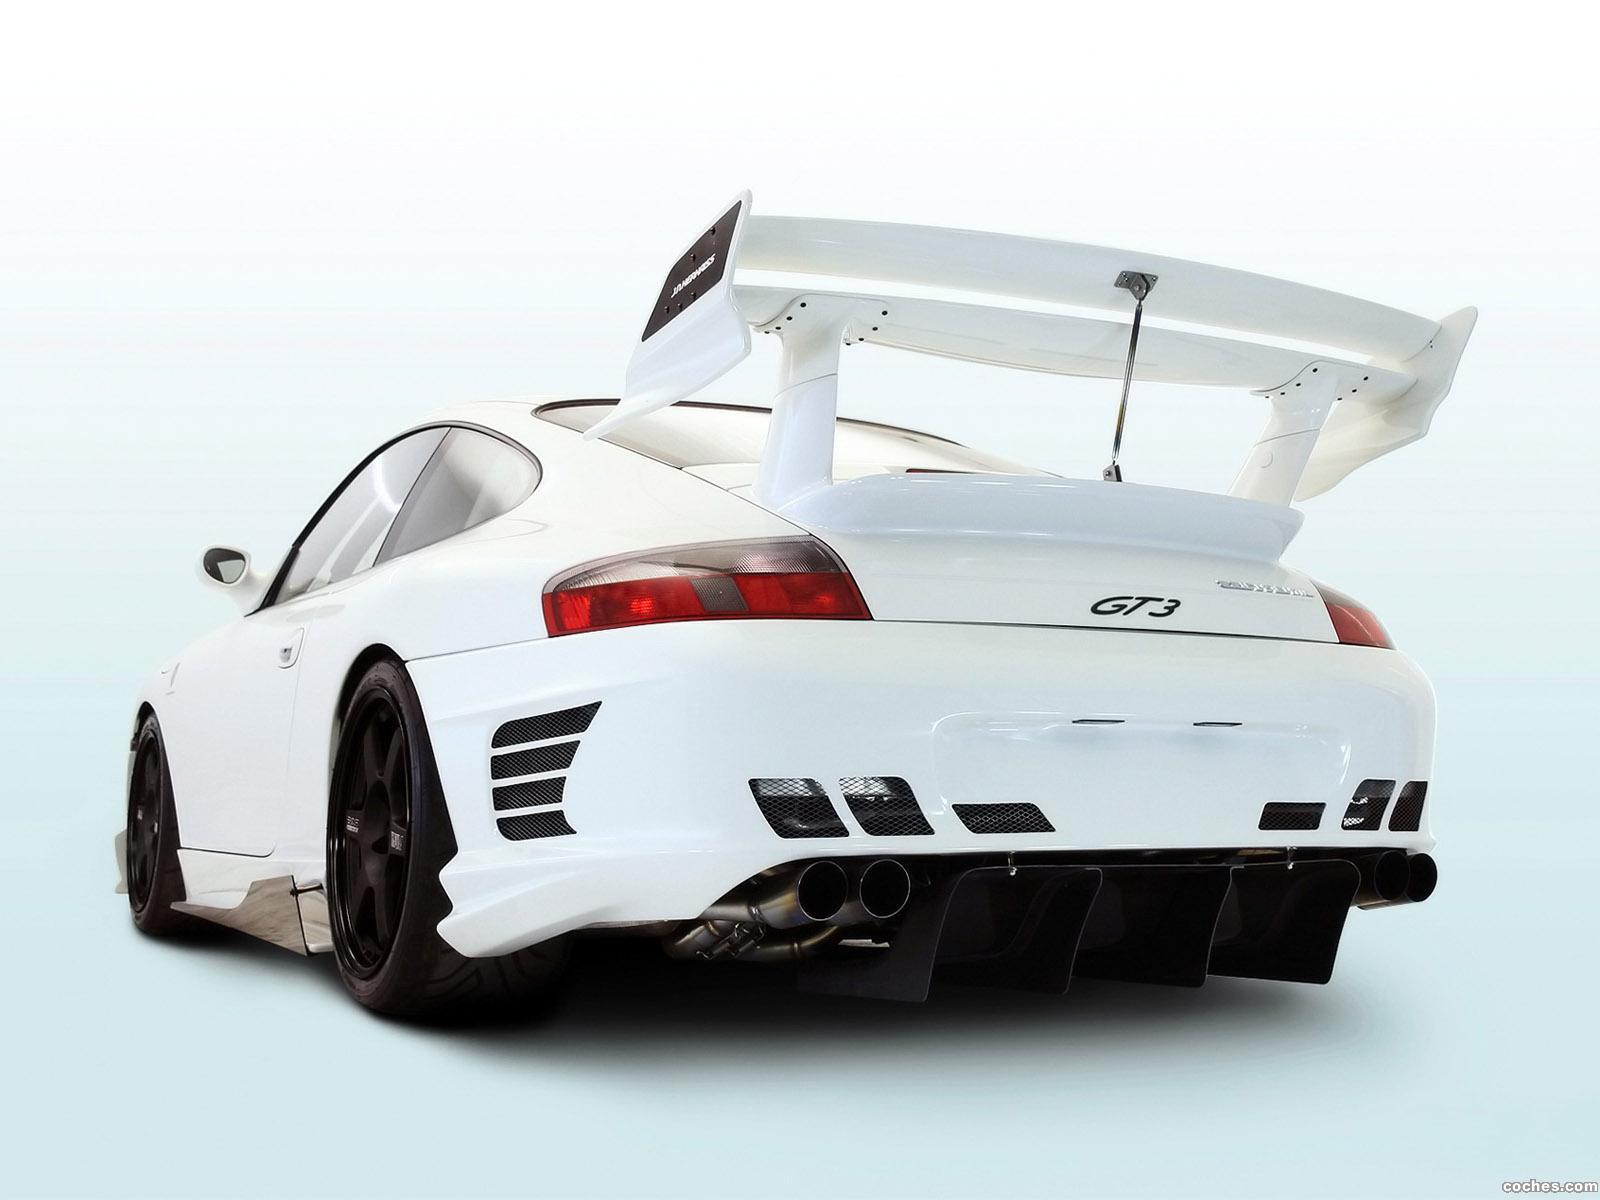 Foto 1 de J. N. Hepaiss Porsche  911 GT3 996 2006